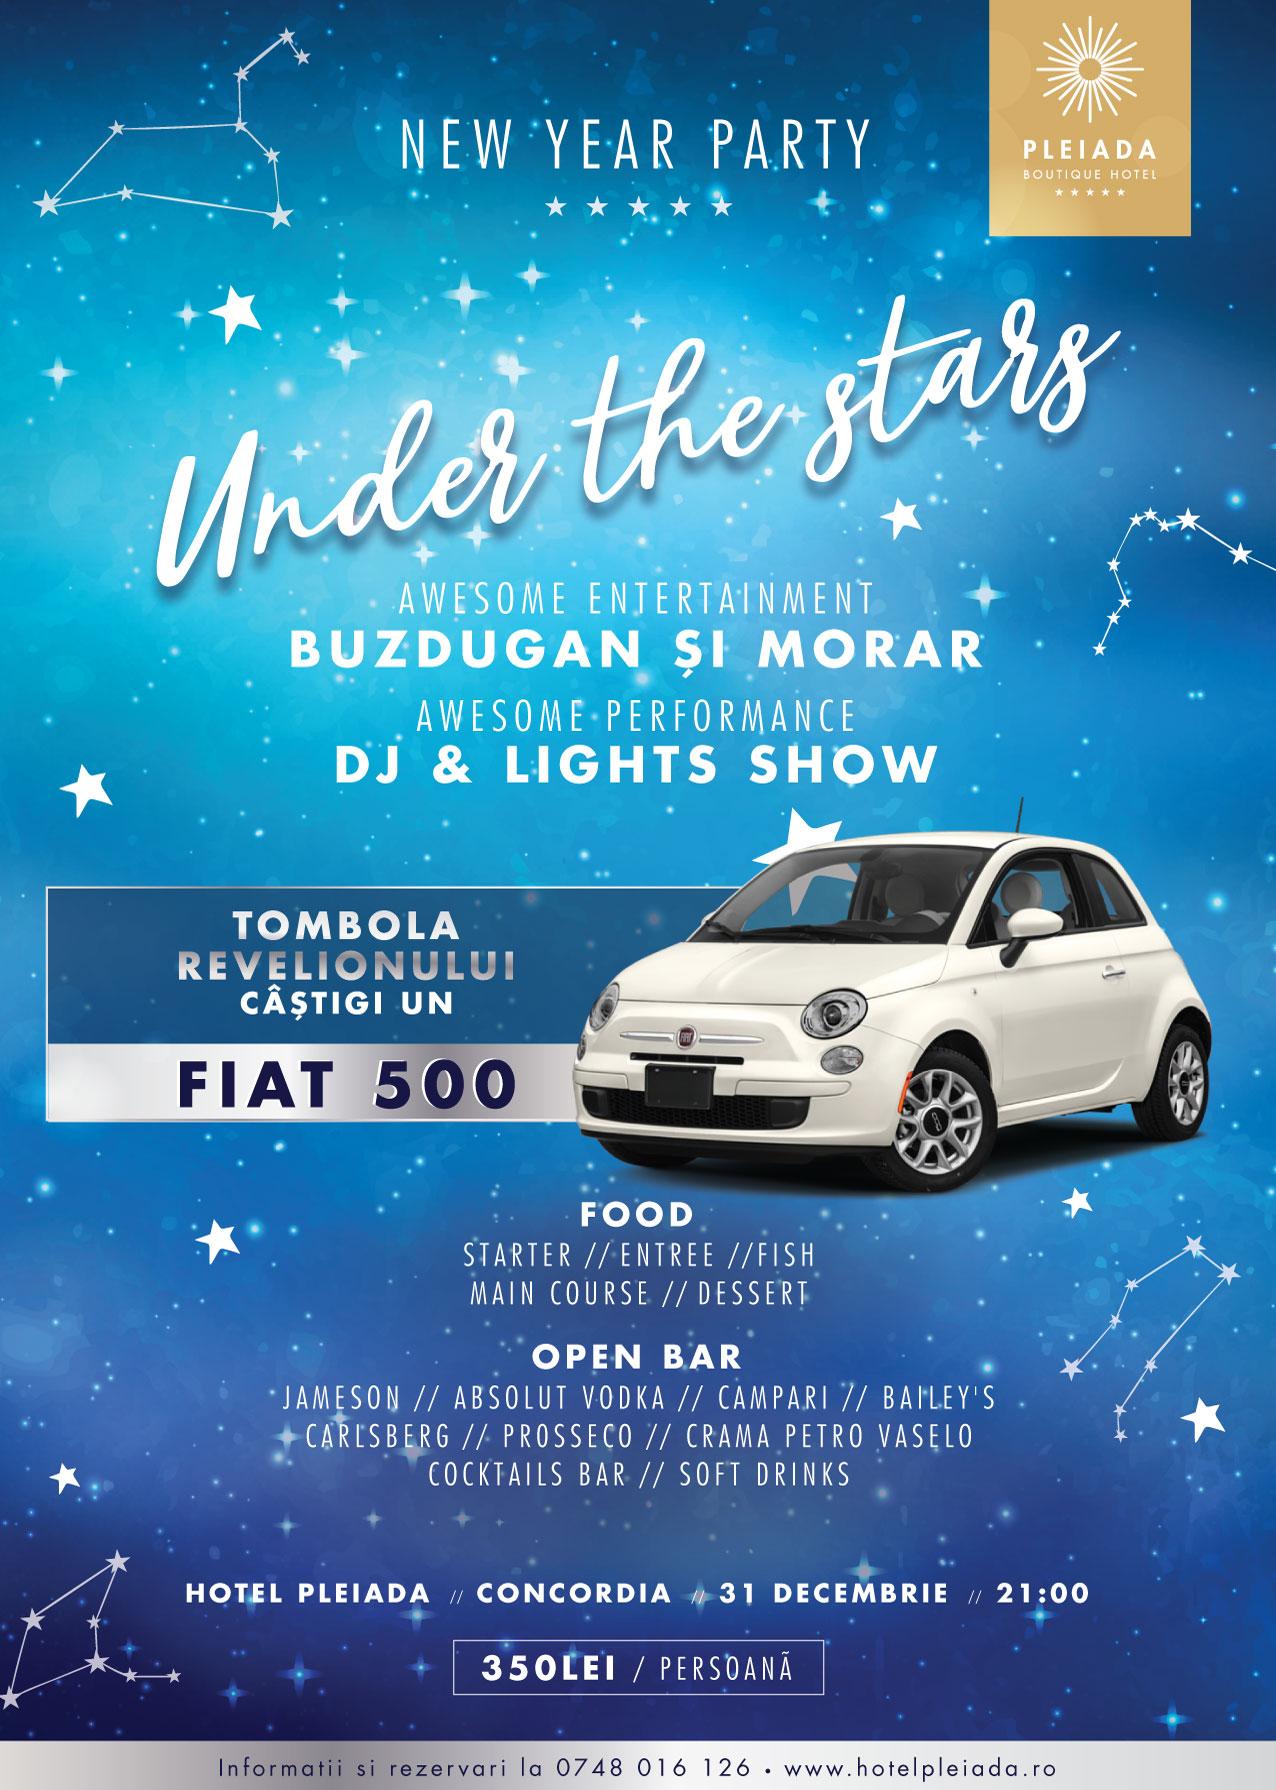 Revelion_Pleiada_Iasi_New_Year_Party_Under_The_Stars-V2